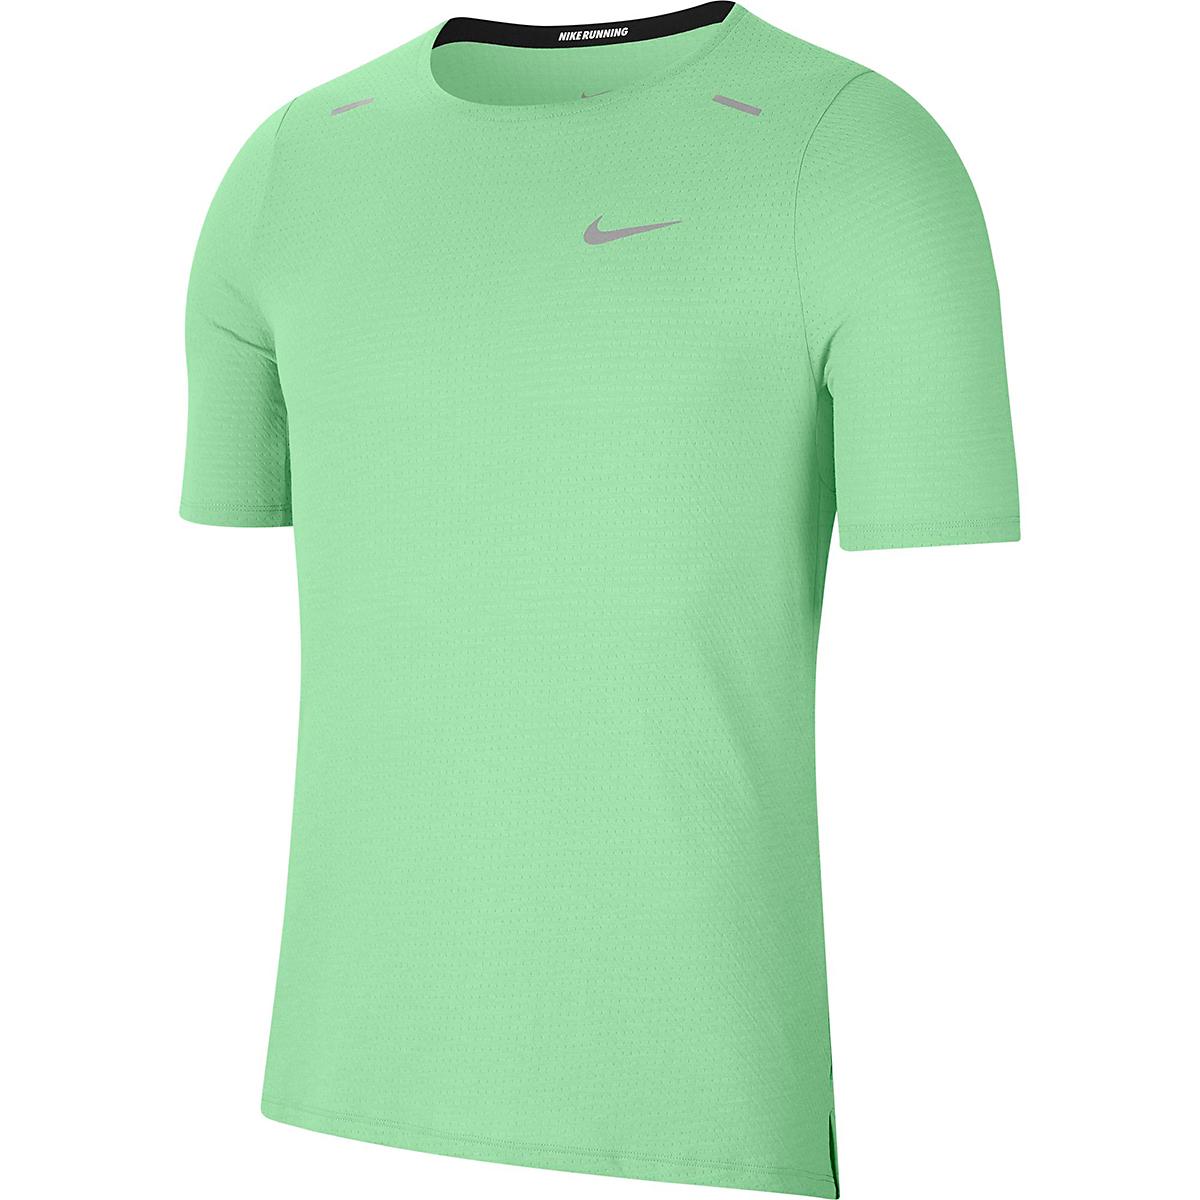 Men's Nike Rise 365 Short Sleeve  - Color: Cucumber Calm - Size: S, Cucumber Calm, large, image 3